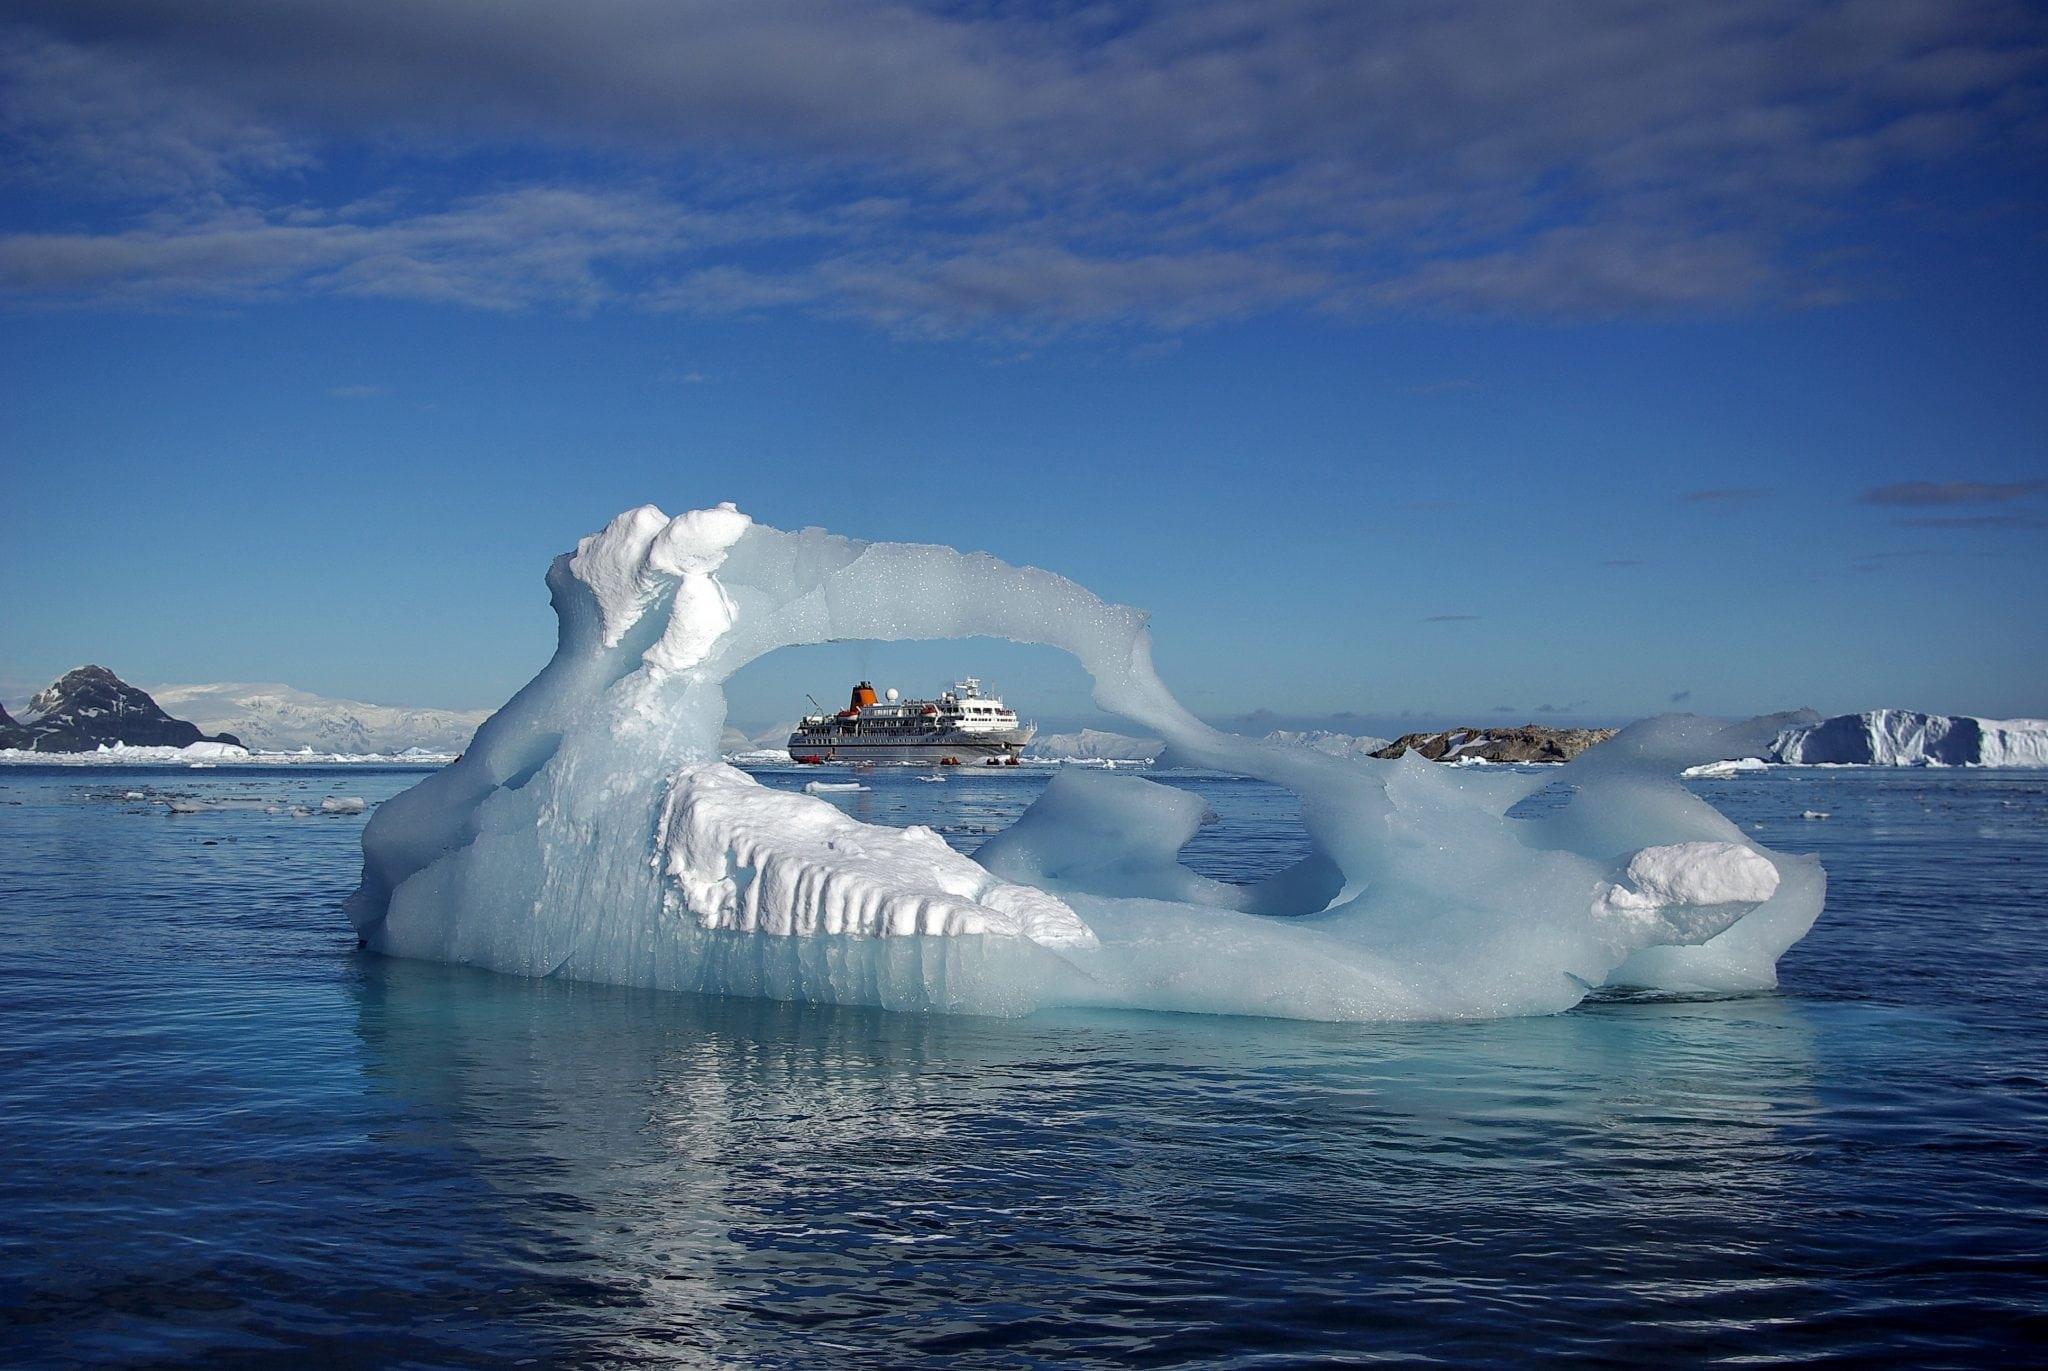 Kreuzfahrtschiff Antarktis- C - Fabian Ritter